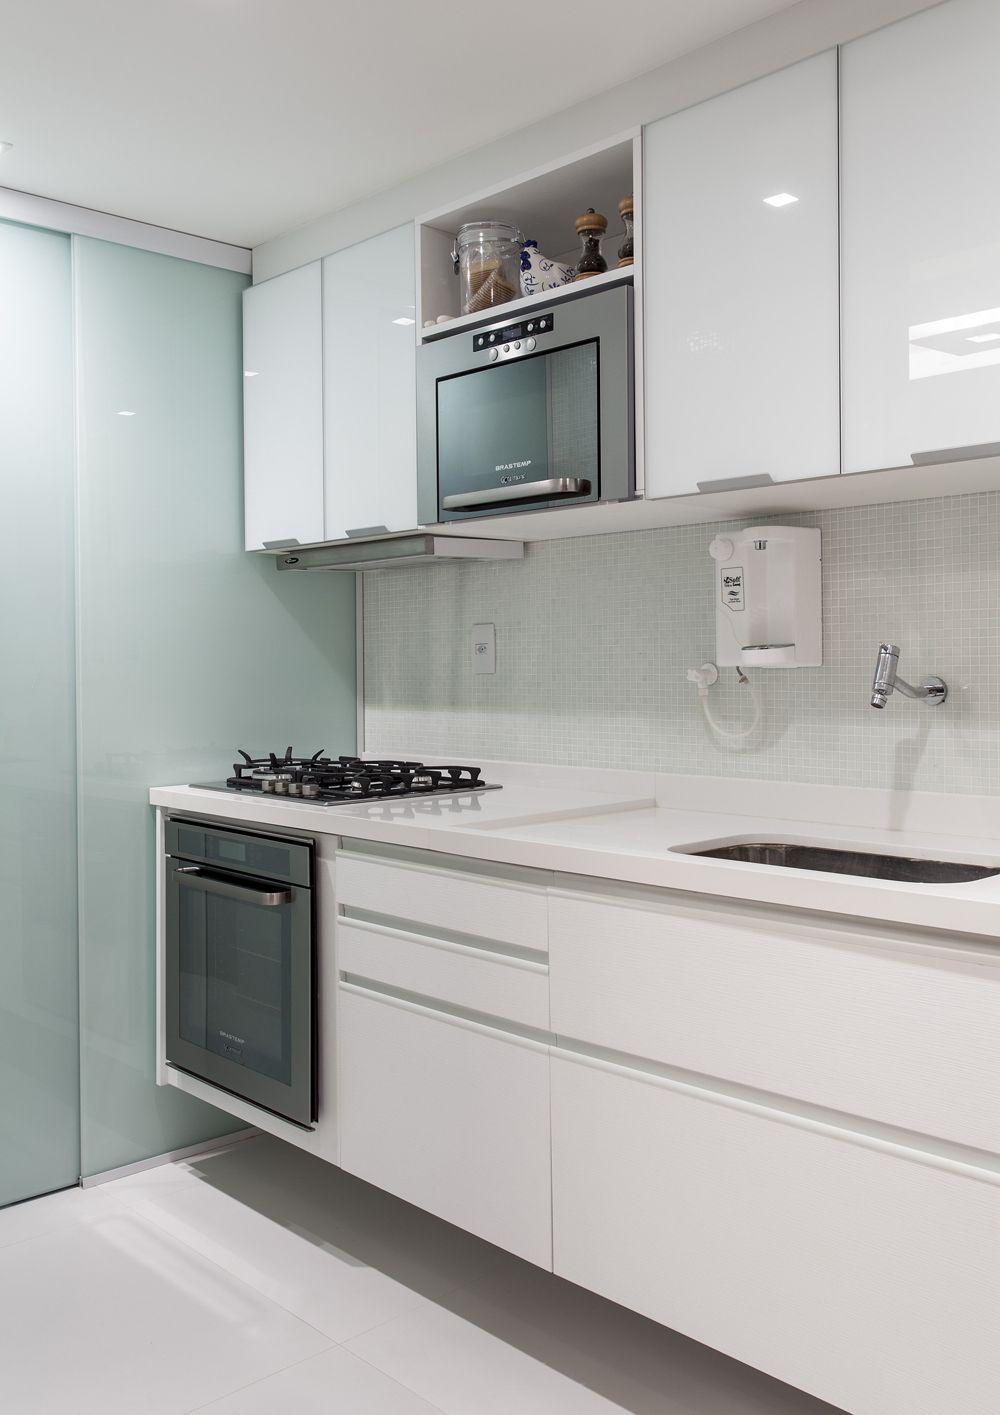 Para aproximar a fam lia cocinas perfecta y interiores for Cocinas apartamentos pequenos